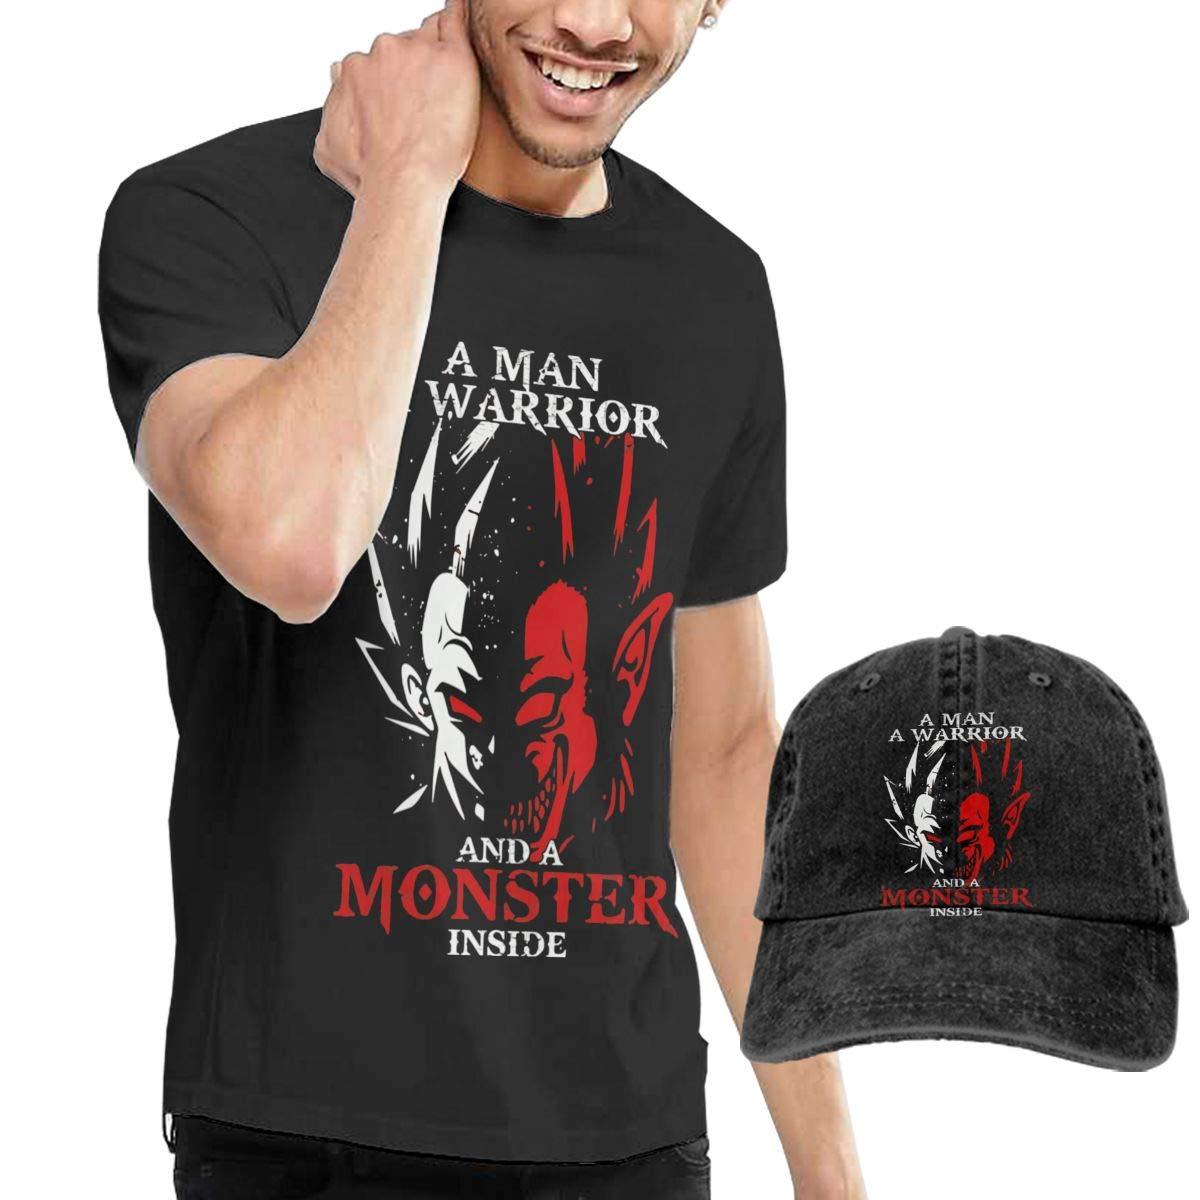 Xzmafthfrw Man Dragonball Z Goku and Vegeta Casual T-Shirt with Cowboy Hat